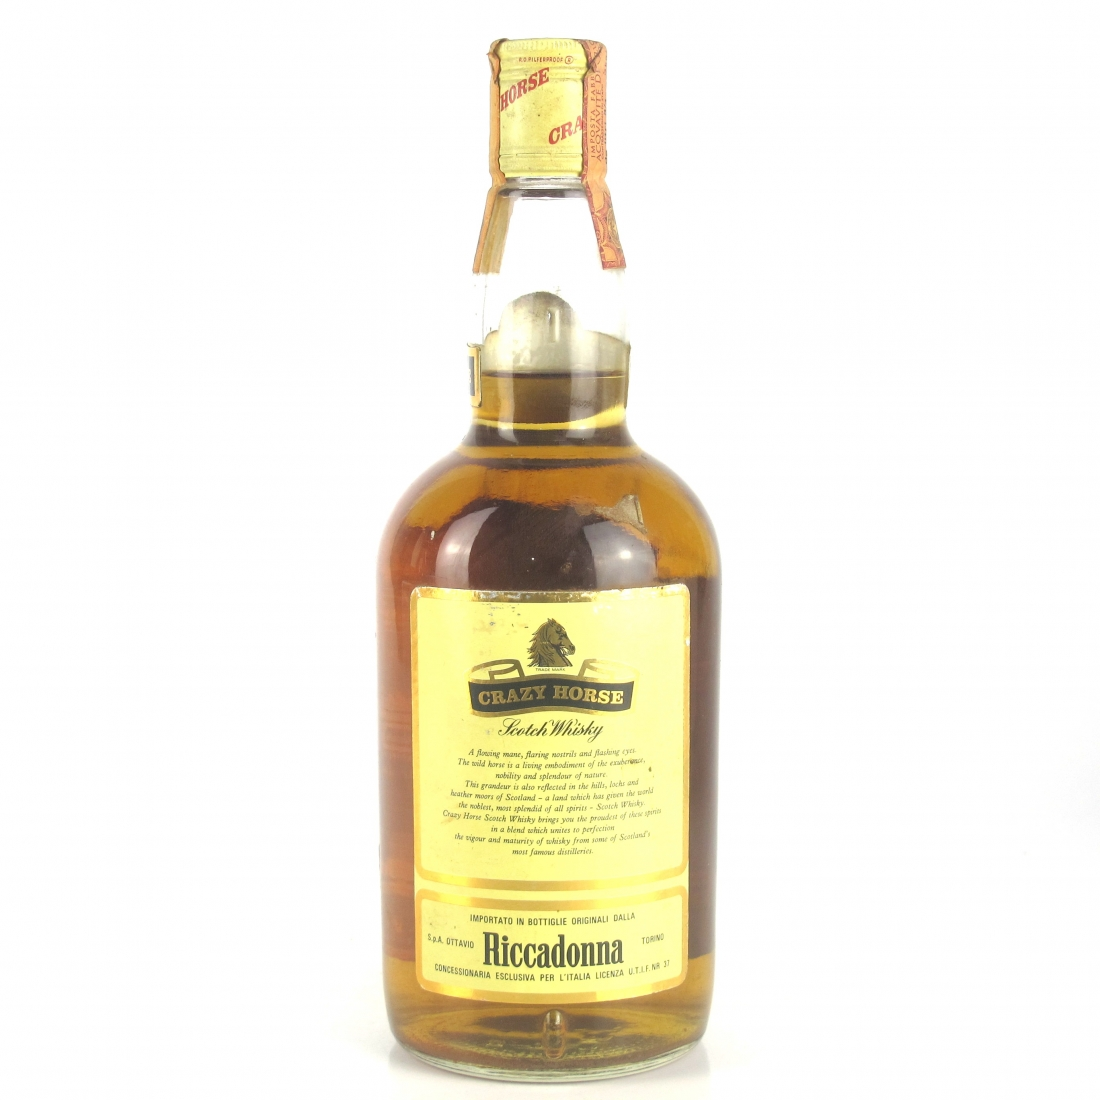 Crazy Horse Scotch Whisky 1970s